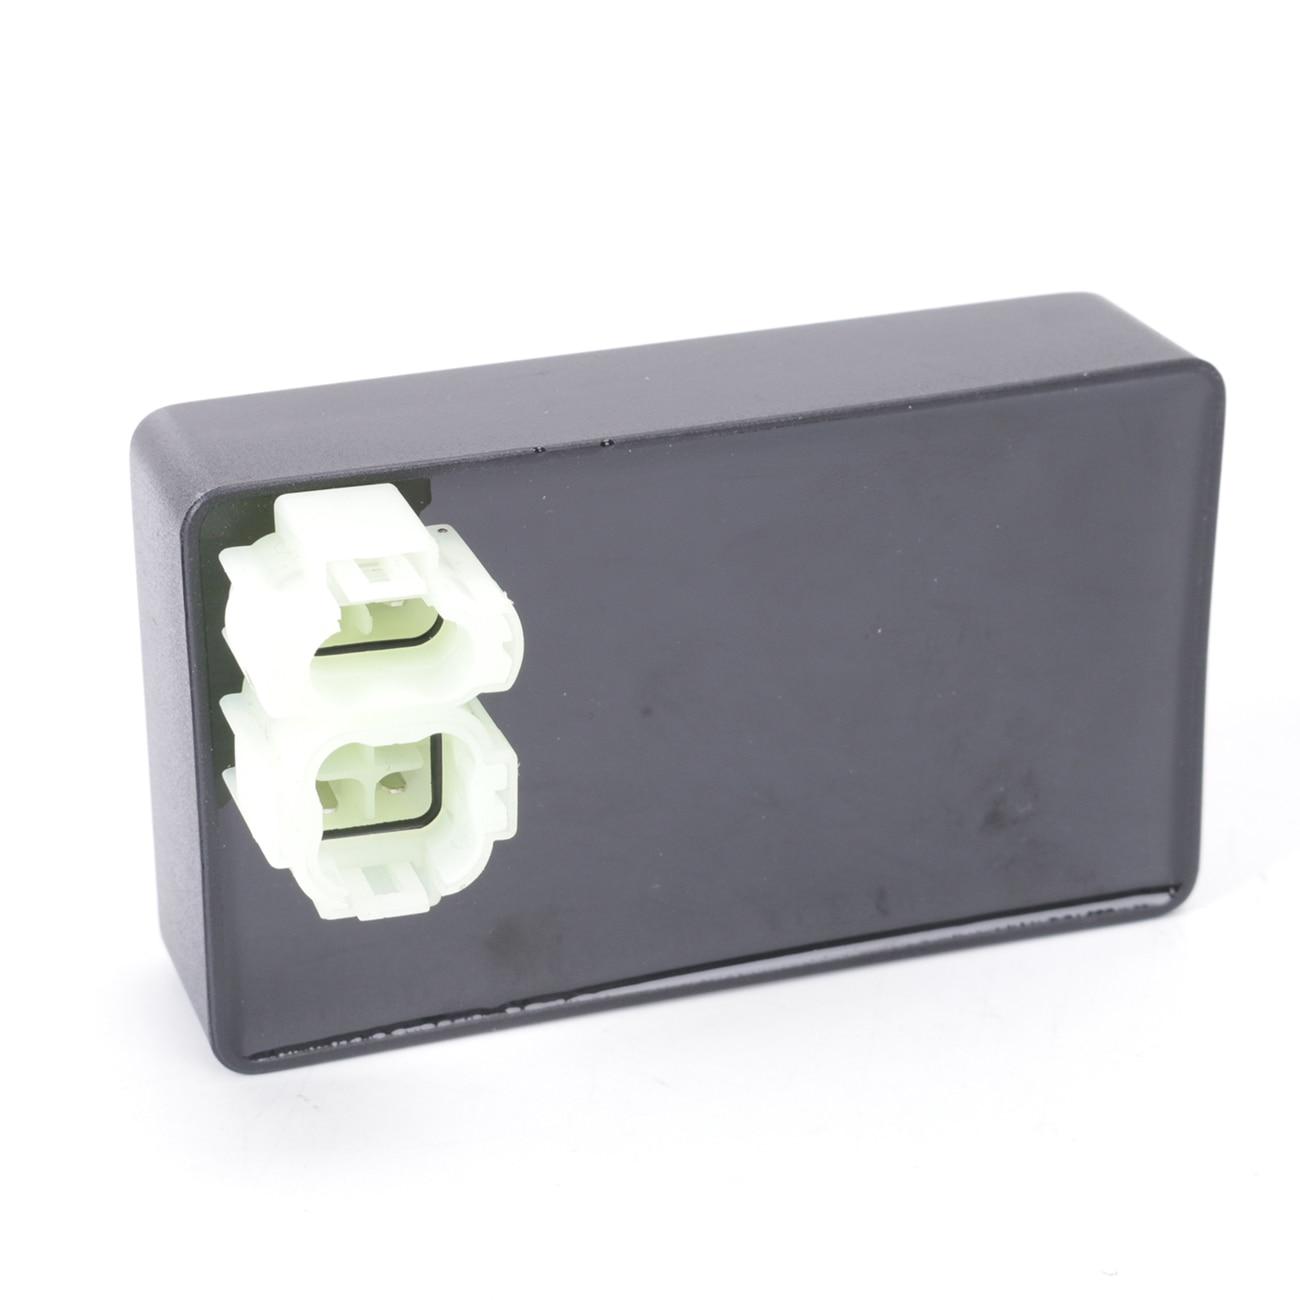 Aftermarket MOSFET CDI Unit For Honda 650 XR650L NX650 Dominator Moto Ignition Control Module ICM CDI Brain #5041